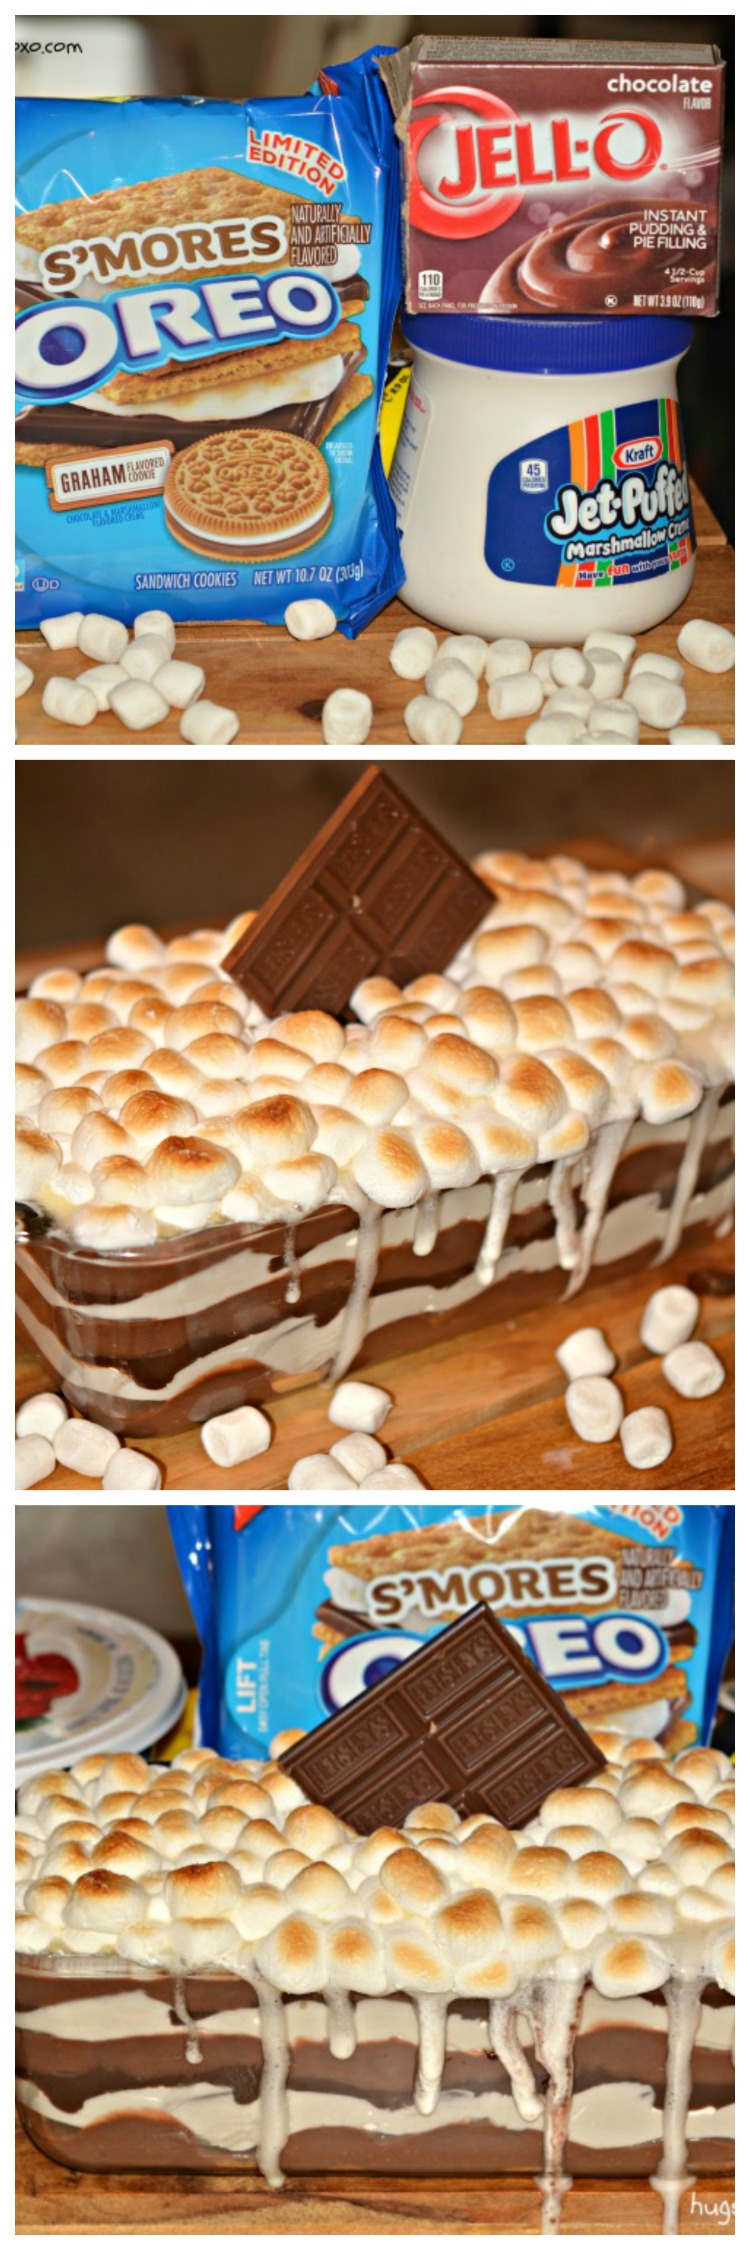 S'mores Cookie Lasagna - Hugs and Cookies XOXO